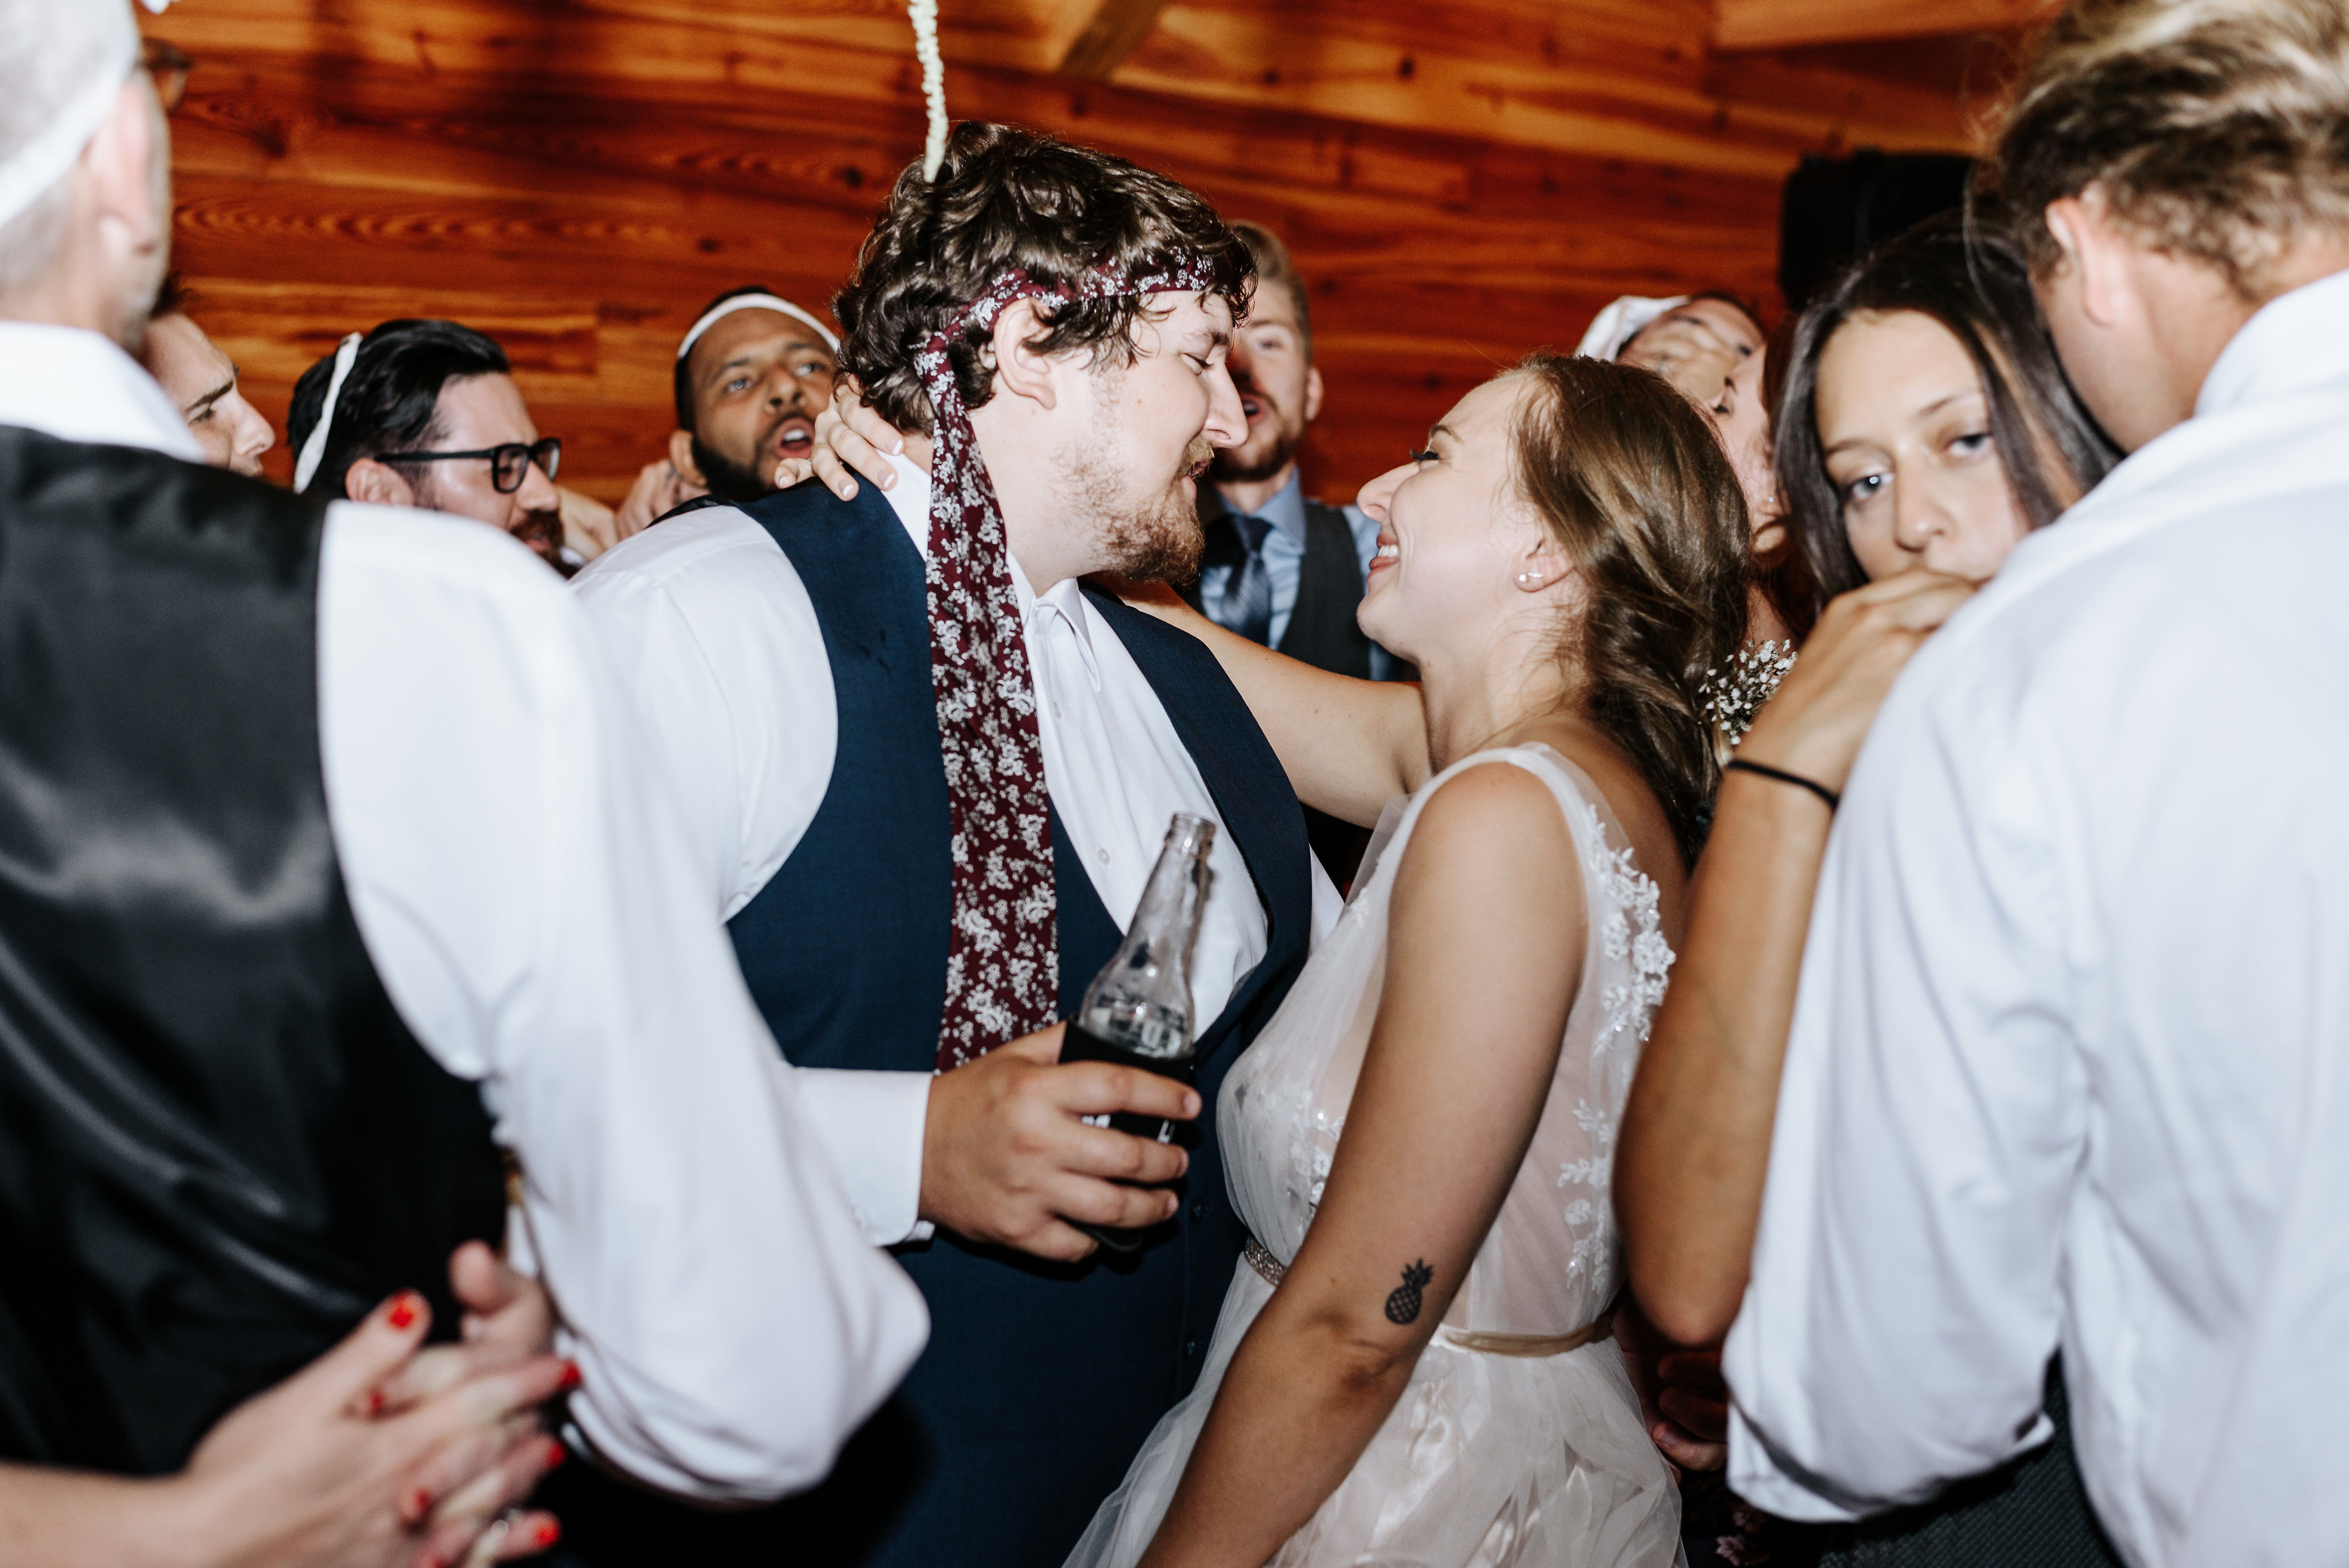 Hanover_Tavern_Wedding_Tori_Jared_Photography_by_V_6241